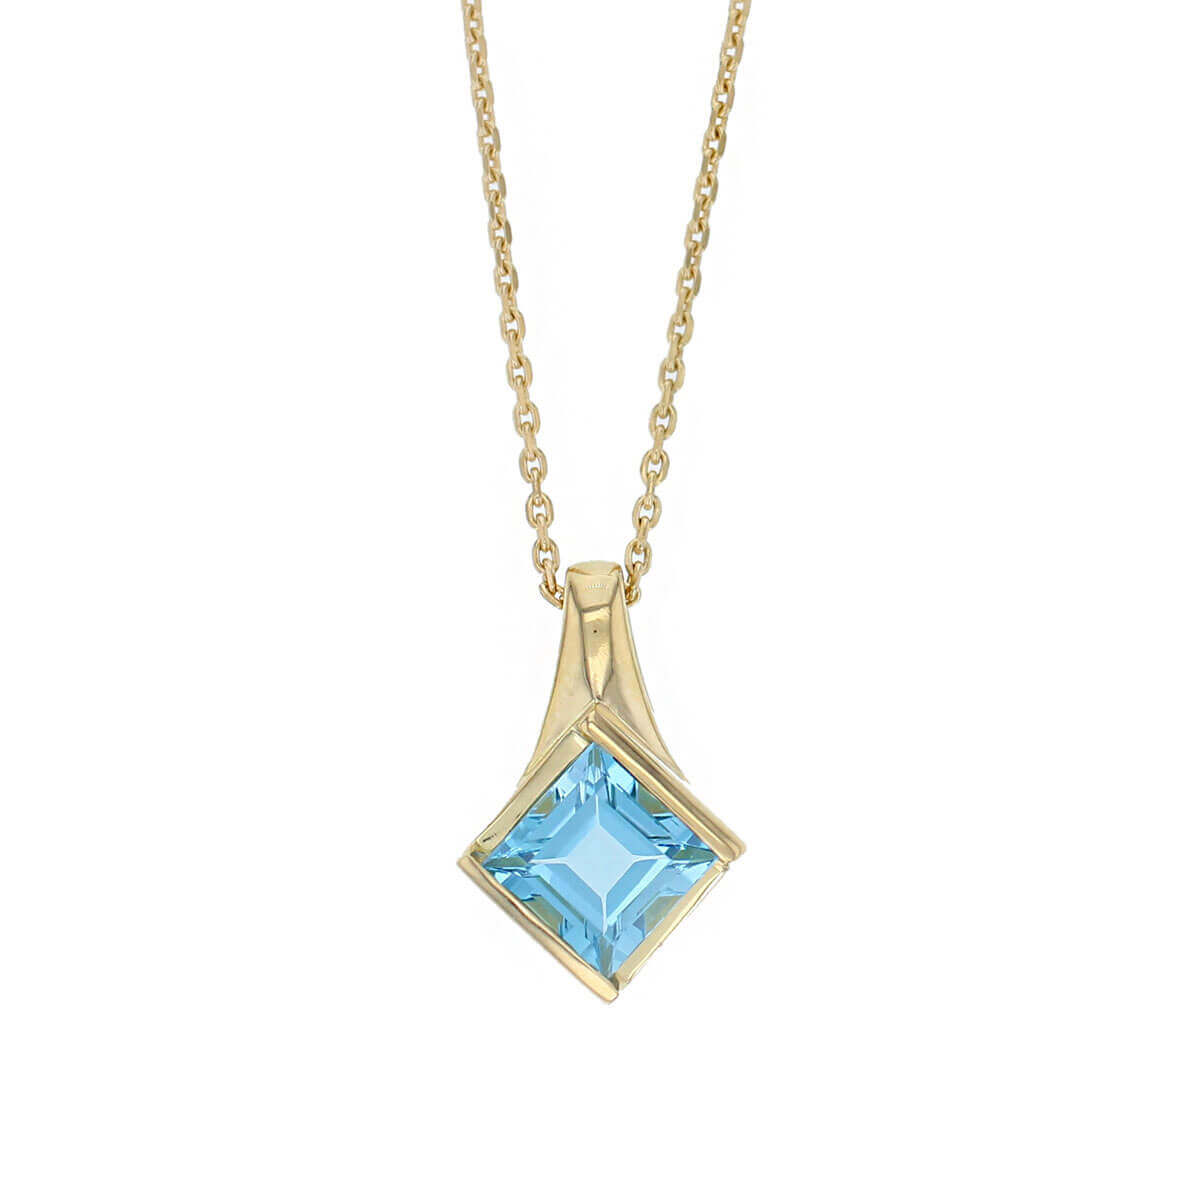 18ct yellow gold princess cut faceted topaz gemstone pendant, designer jewellery, blue quartz gem, jewelry, handmade by Faller, Londonderry, Northern Ireland, Irish hand crafted, darcy, D'arcy, square